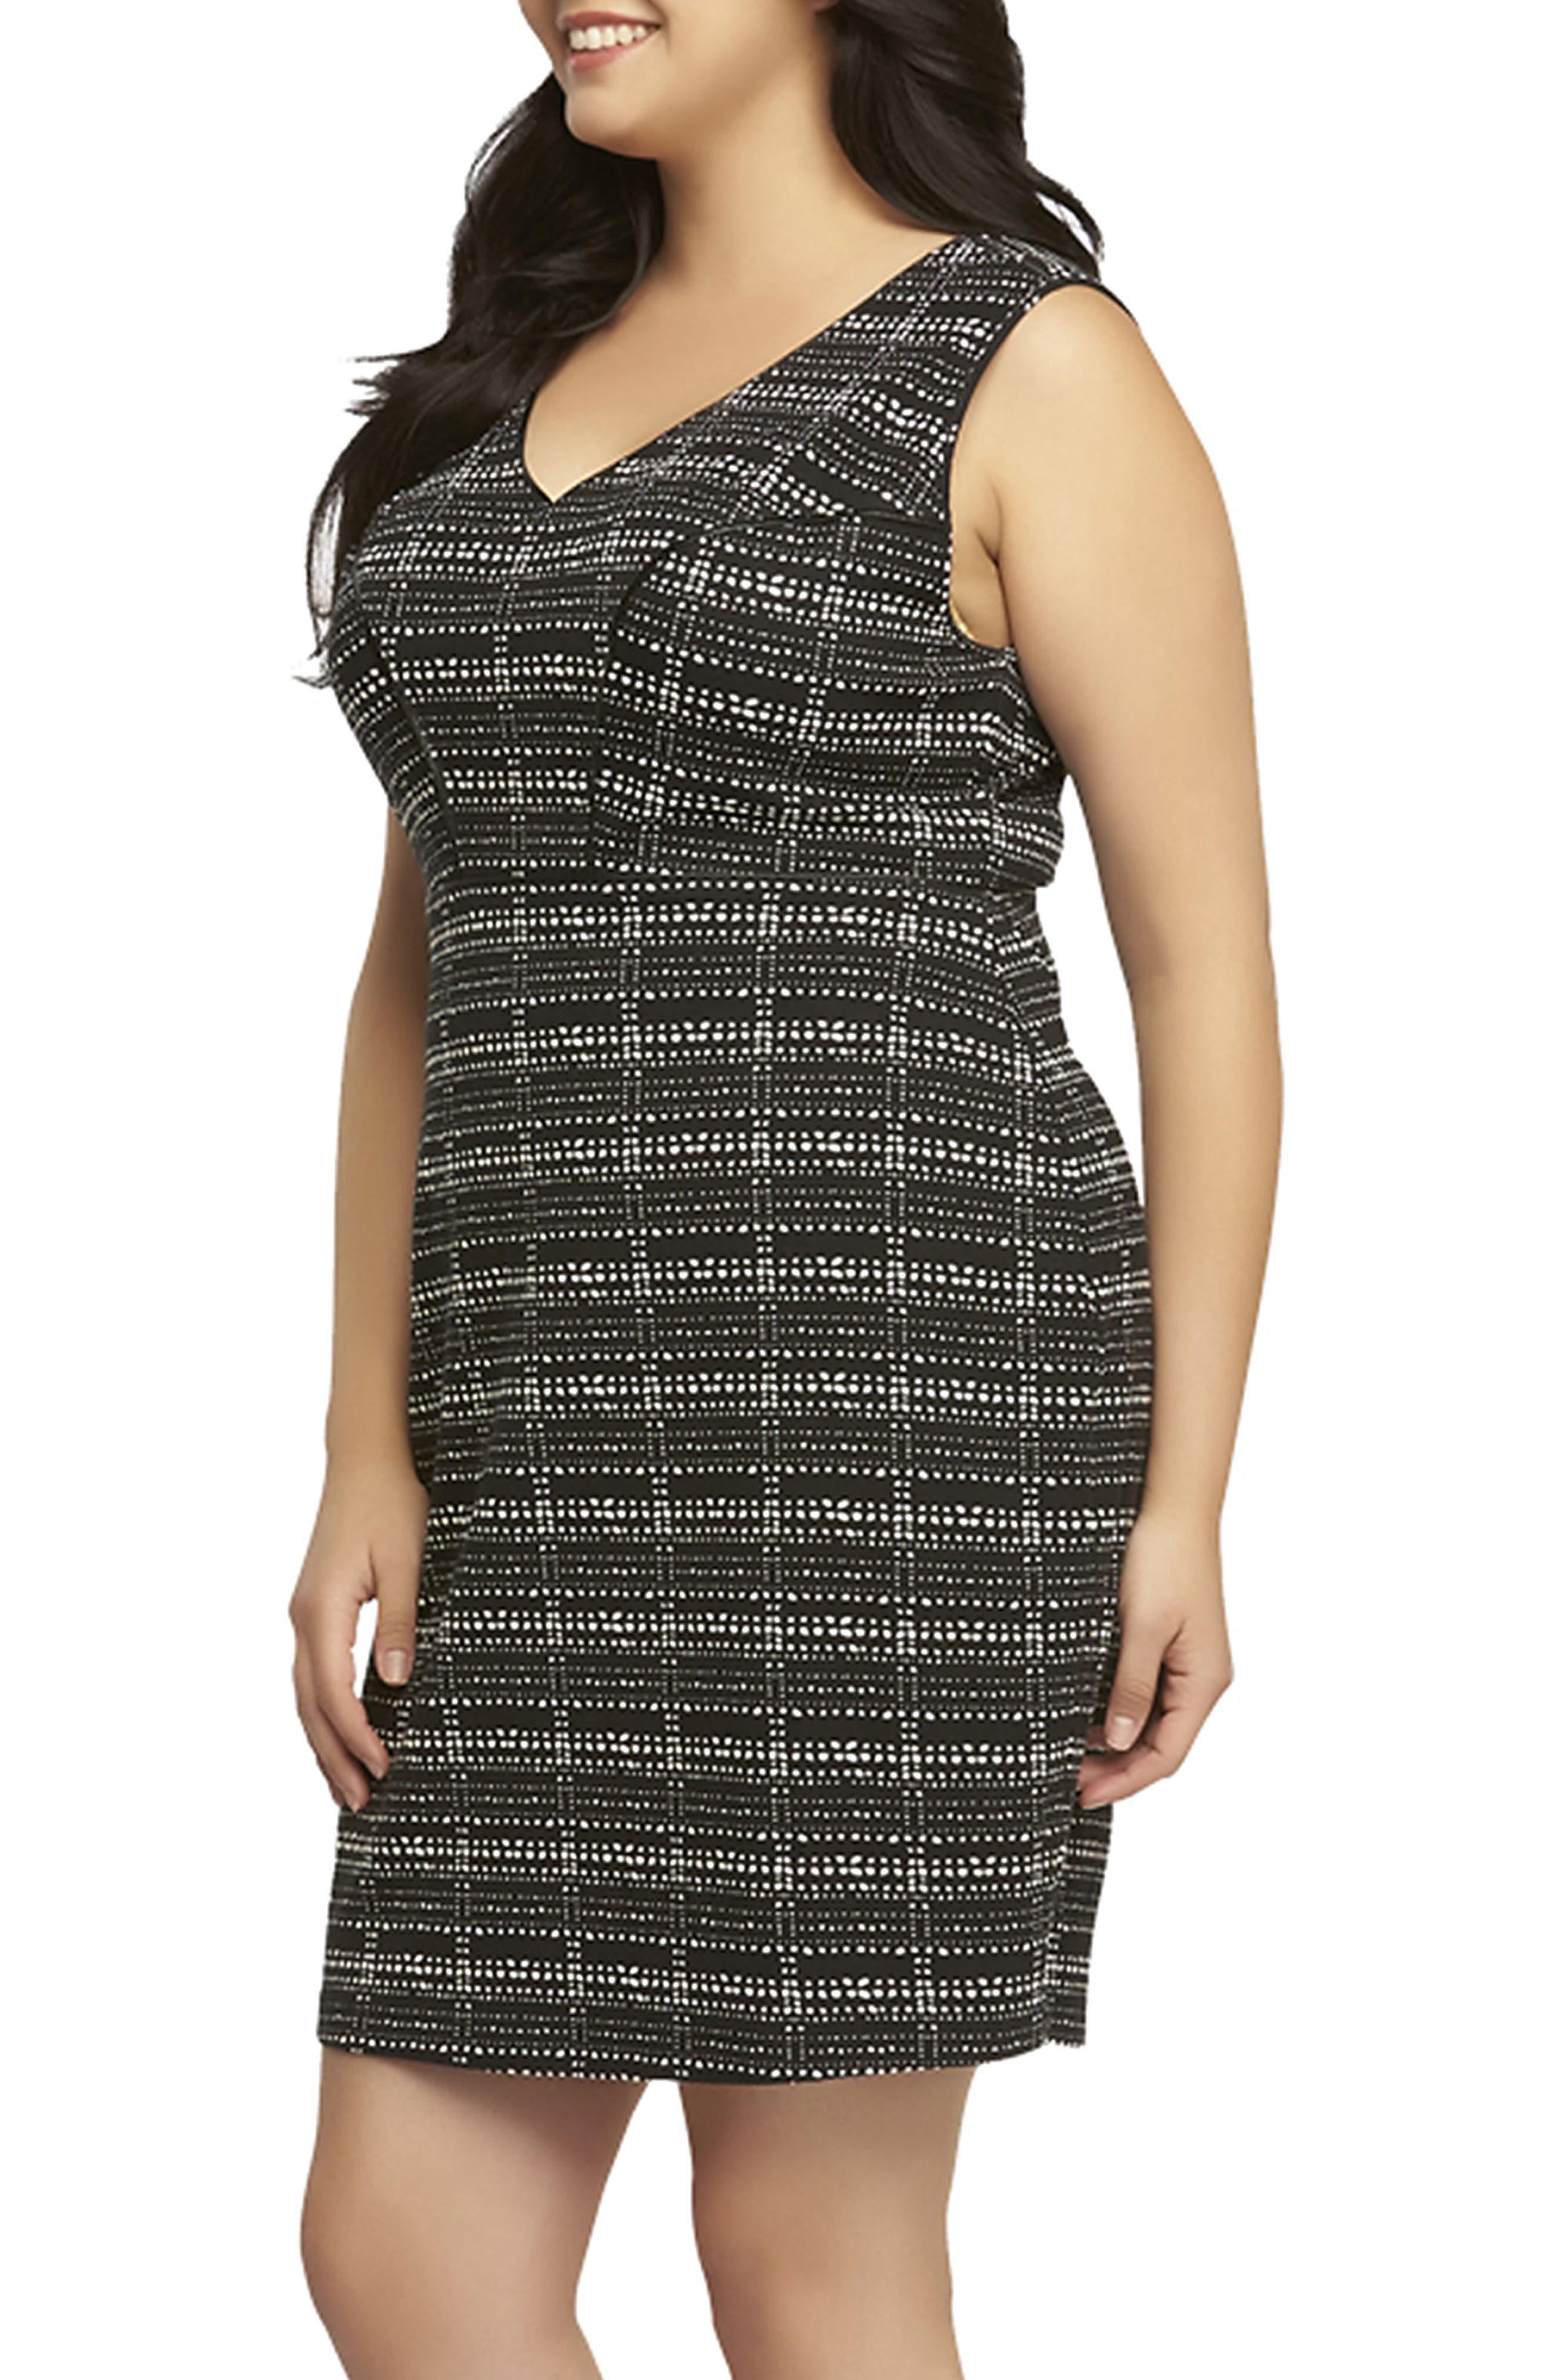 Alternate Image 3  - Tart 'Viera' Piped Detail V-Neck Sheath Dress (Plus Size)